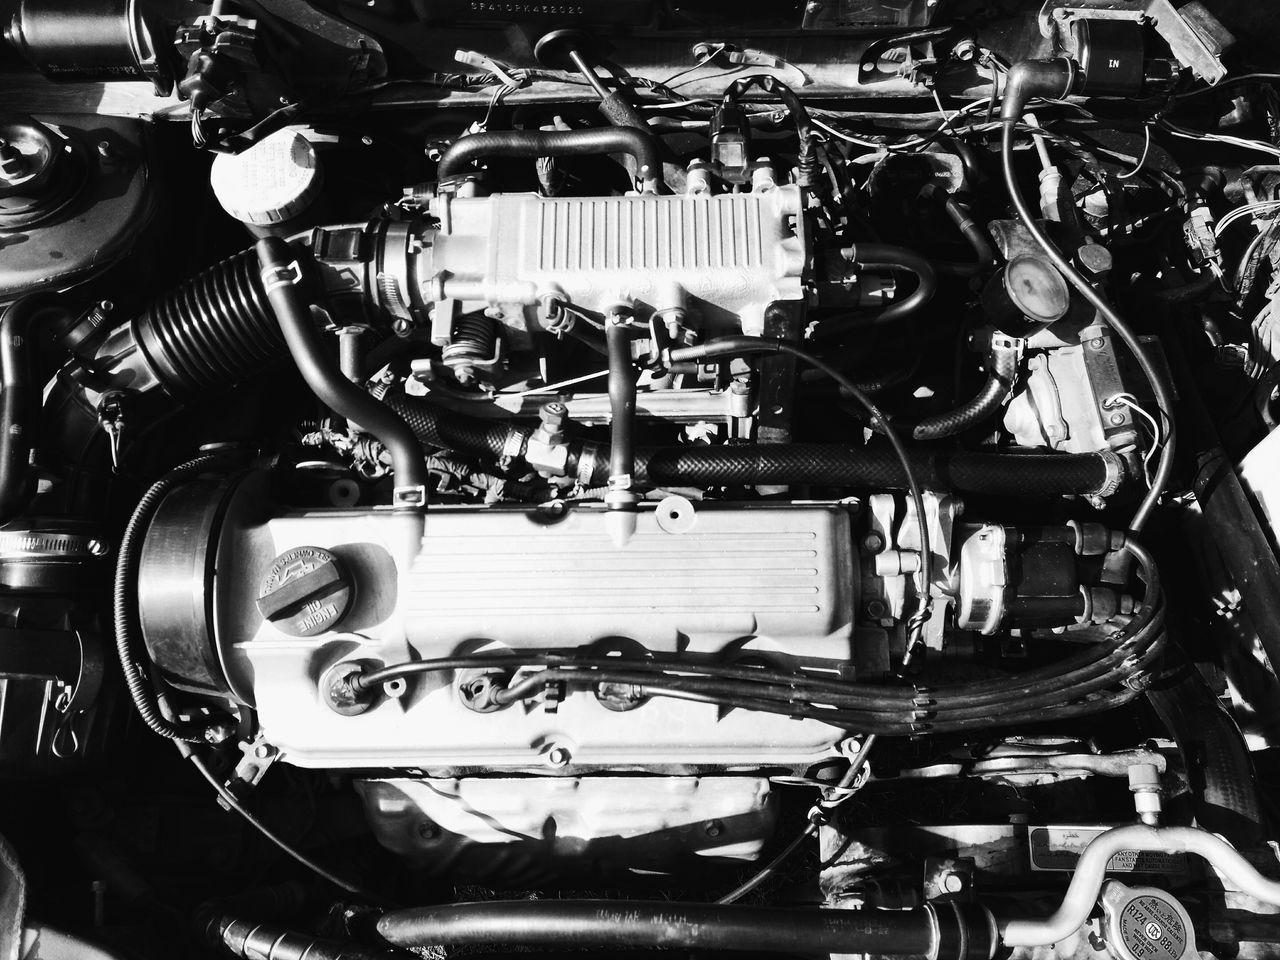 Engine Engine 1000cc Cultus Suzuki Car Bw Old Dusty Day Simple Beauty Wine Moments EyeEmNewHere